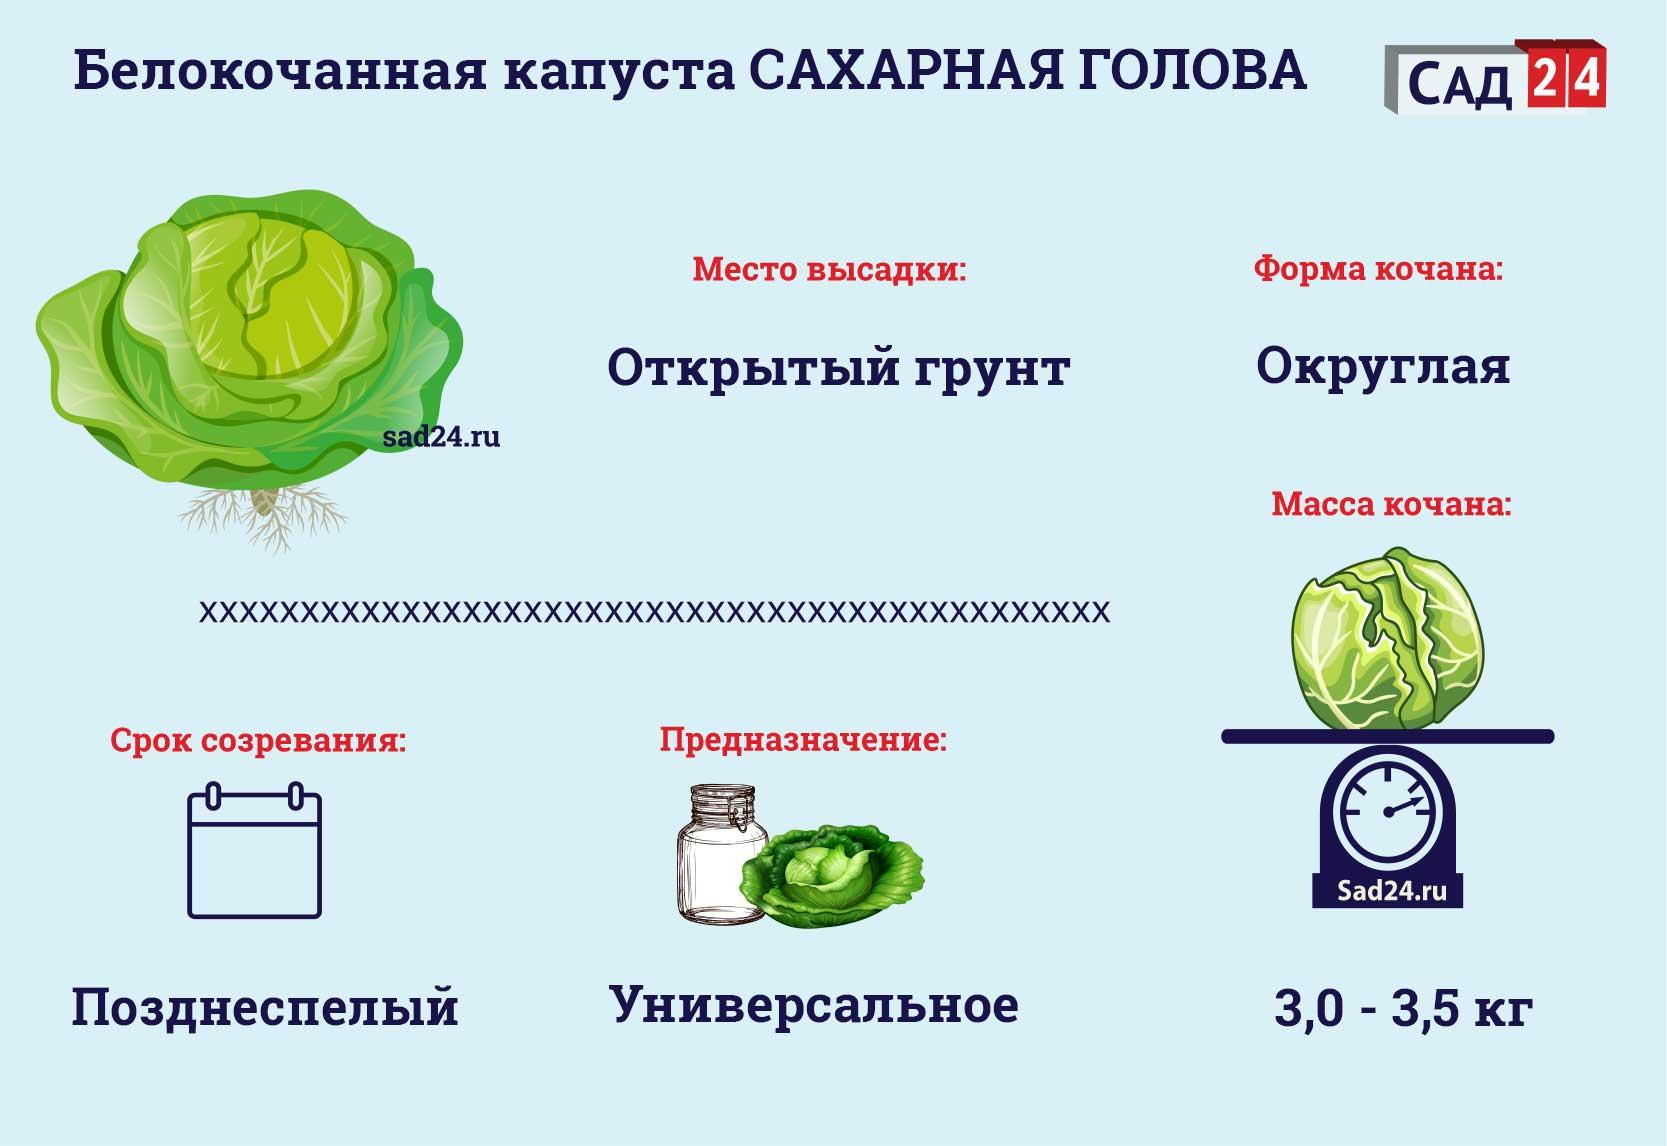 Сахарная голова - https://sad24.ru